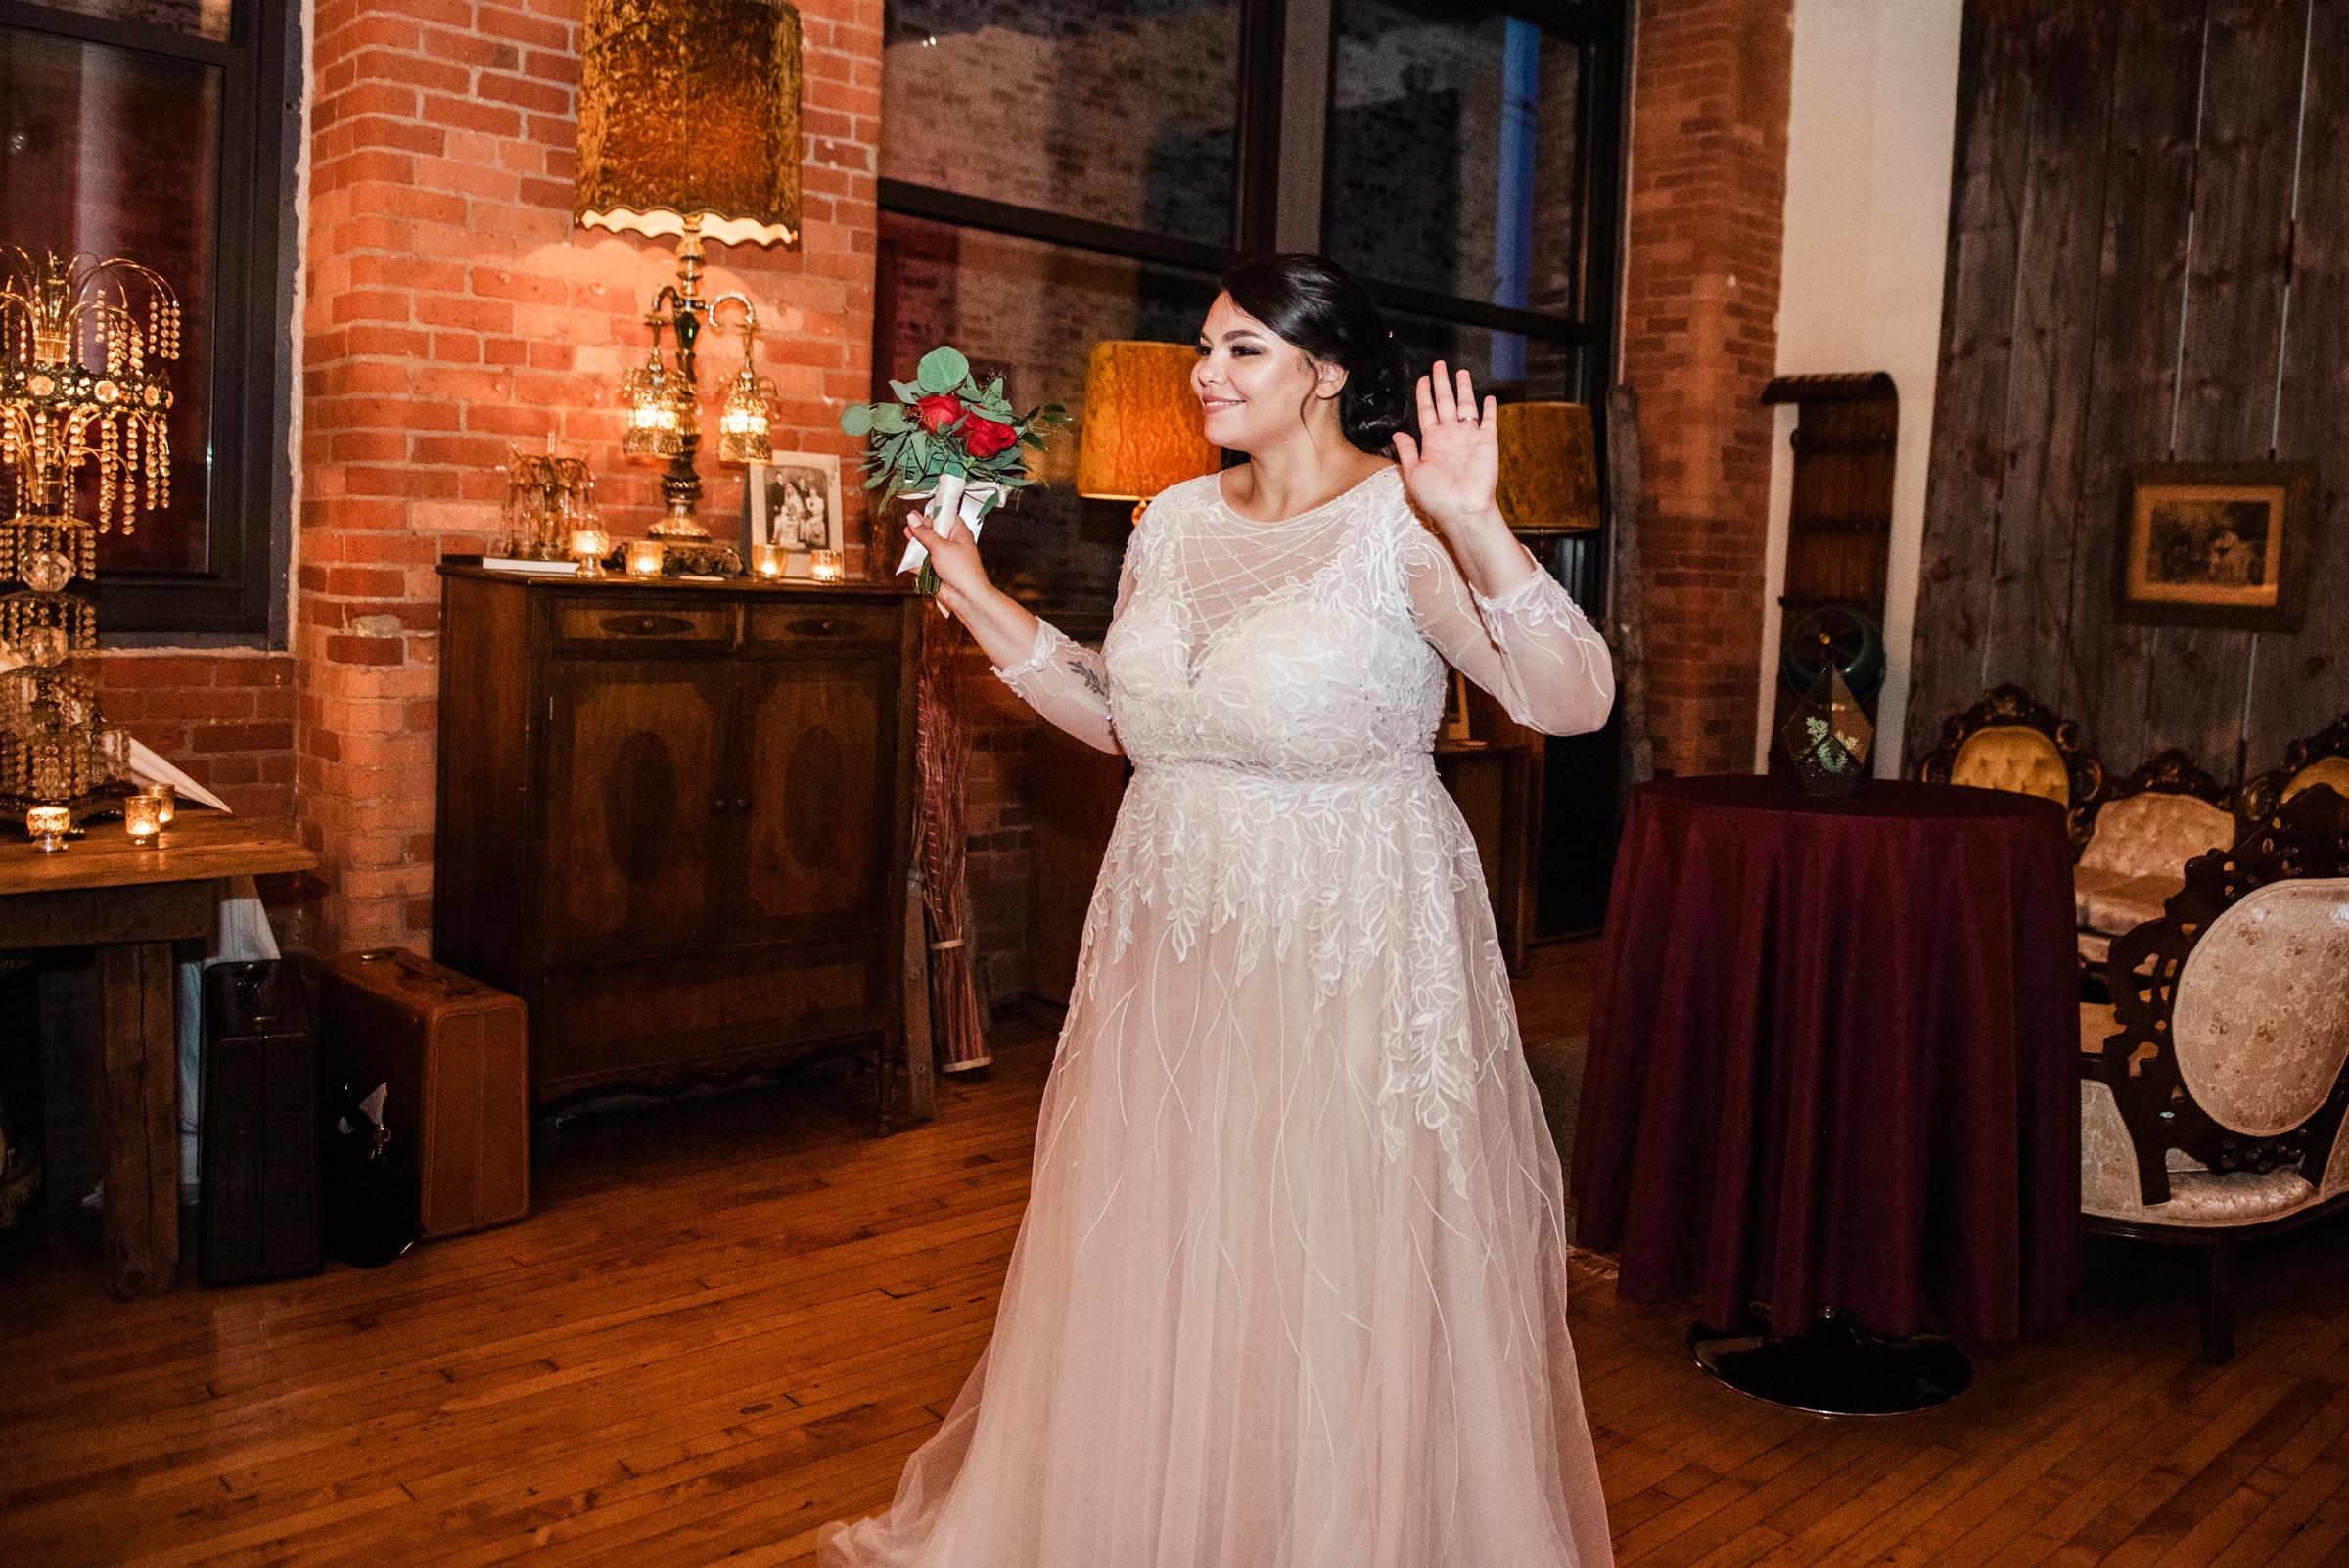 Studio_180_Lamberton_Conservatory_Rochester_Wedding_JILL_STUDIO_Rochester_NY_Photographer_DSC_9320.jpg